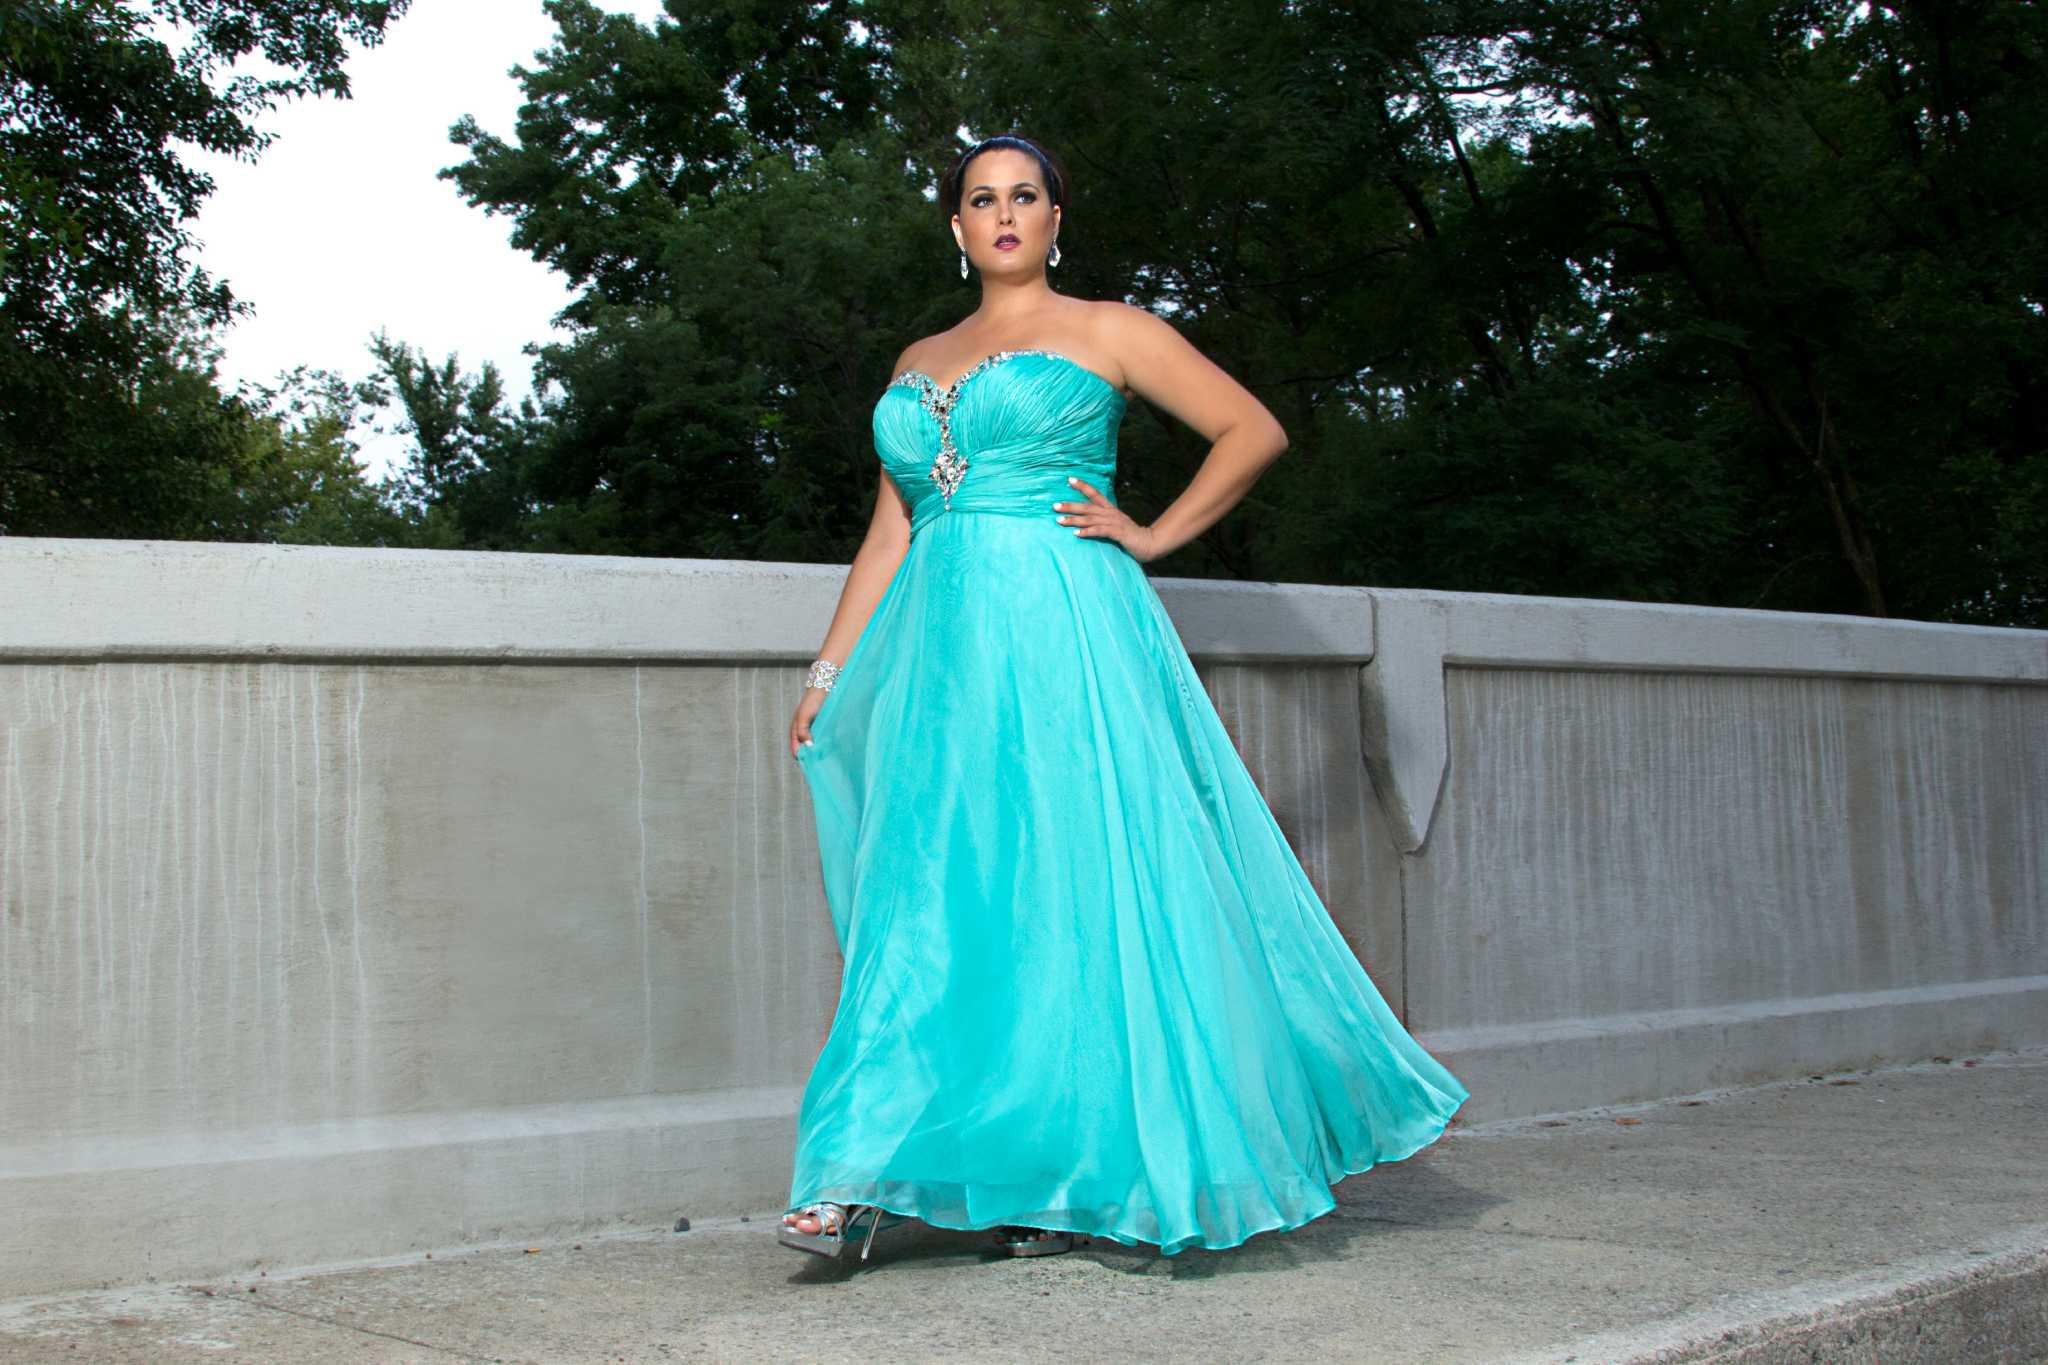 Prom Dress Shopping Perilous For Plus-size Girls